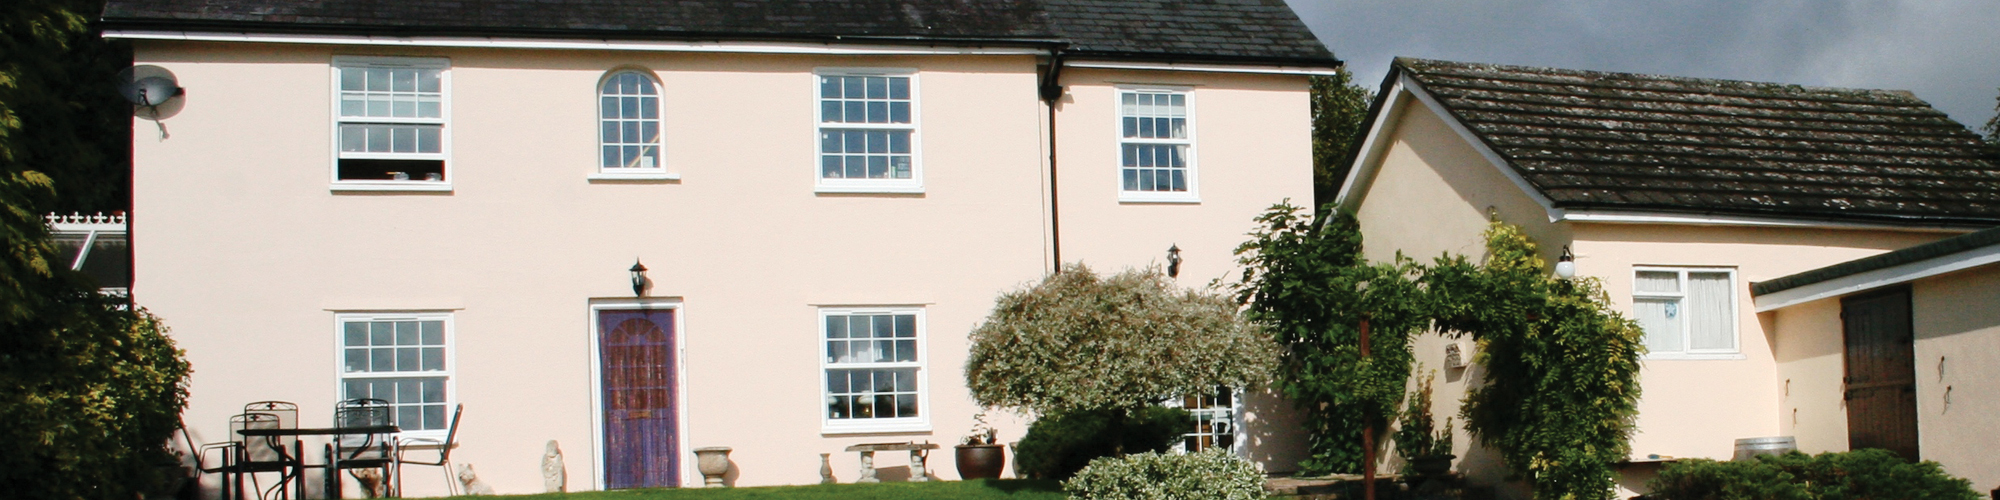 Homeshield Coating Ltd Exterior Wall And Roof Coatings